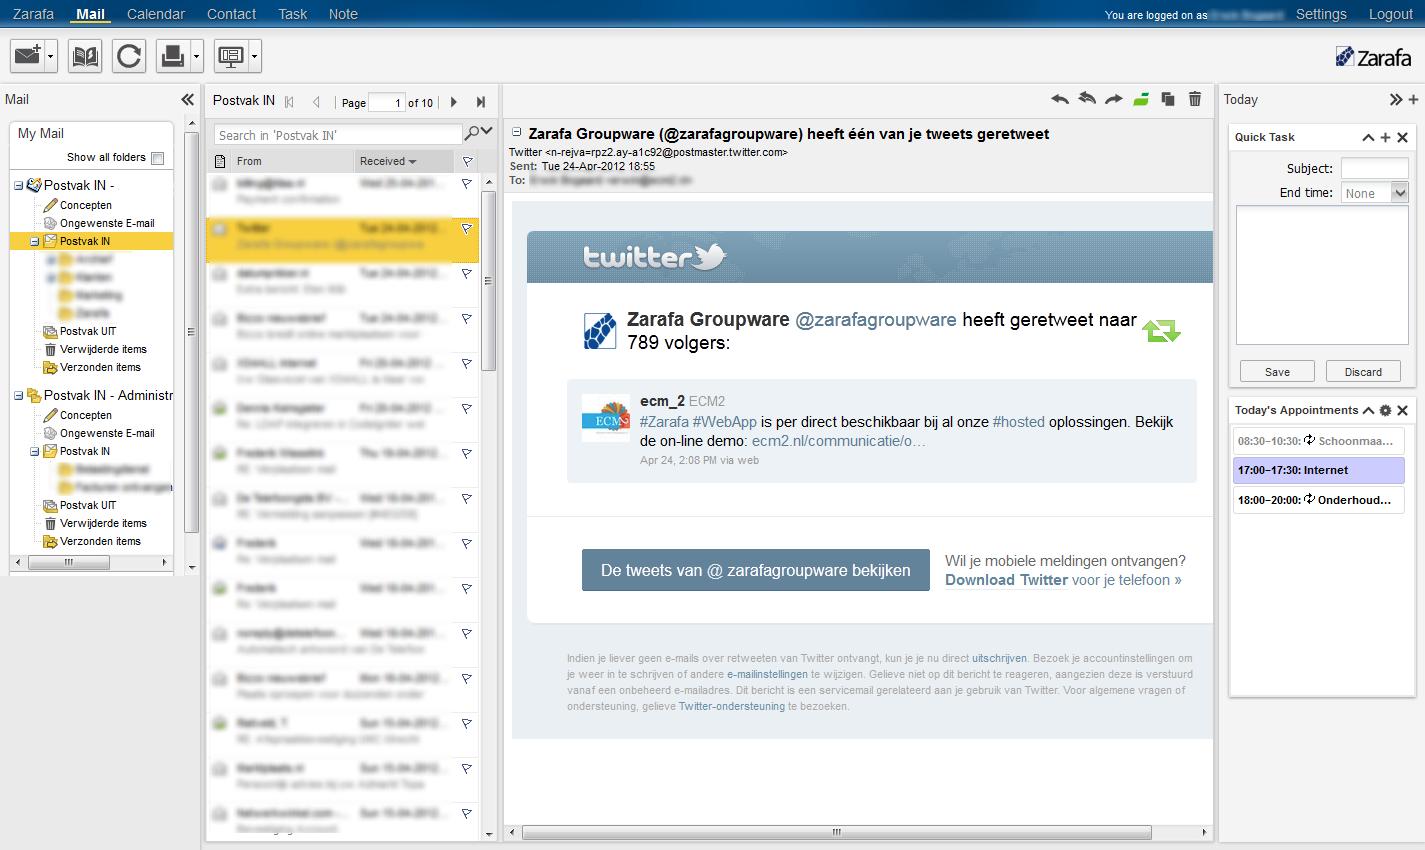 WebApp E-mail